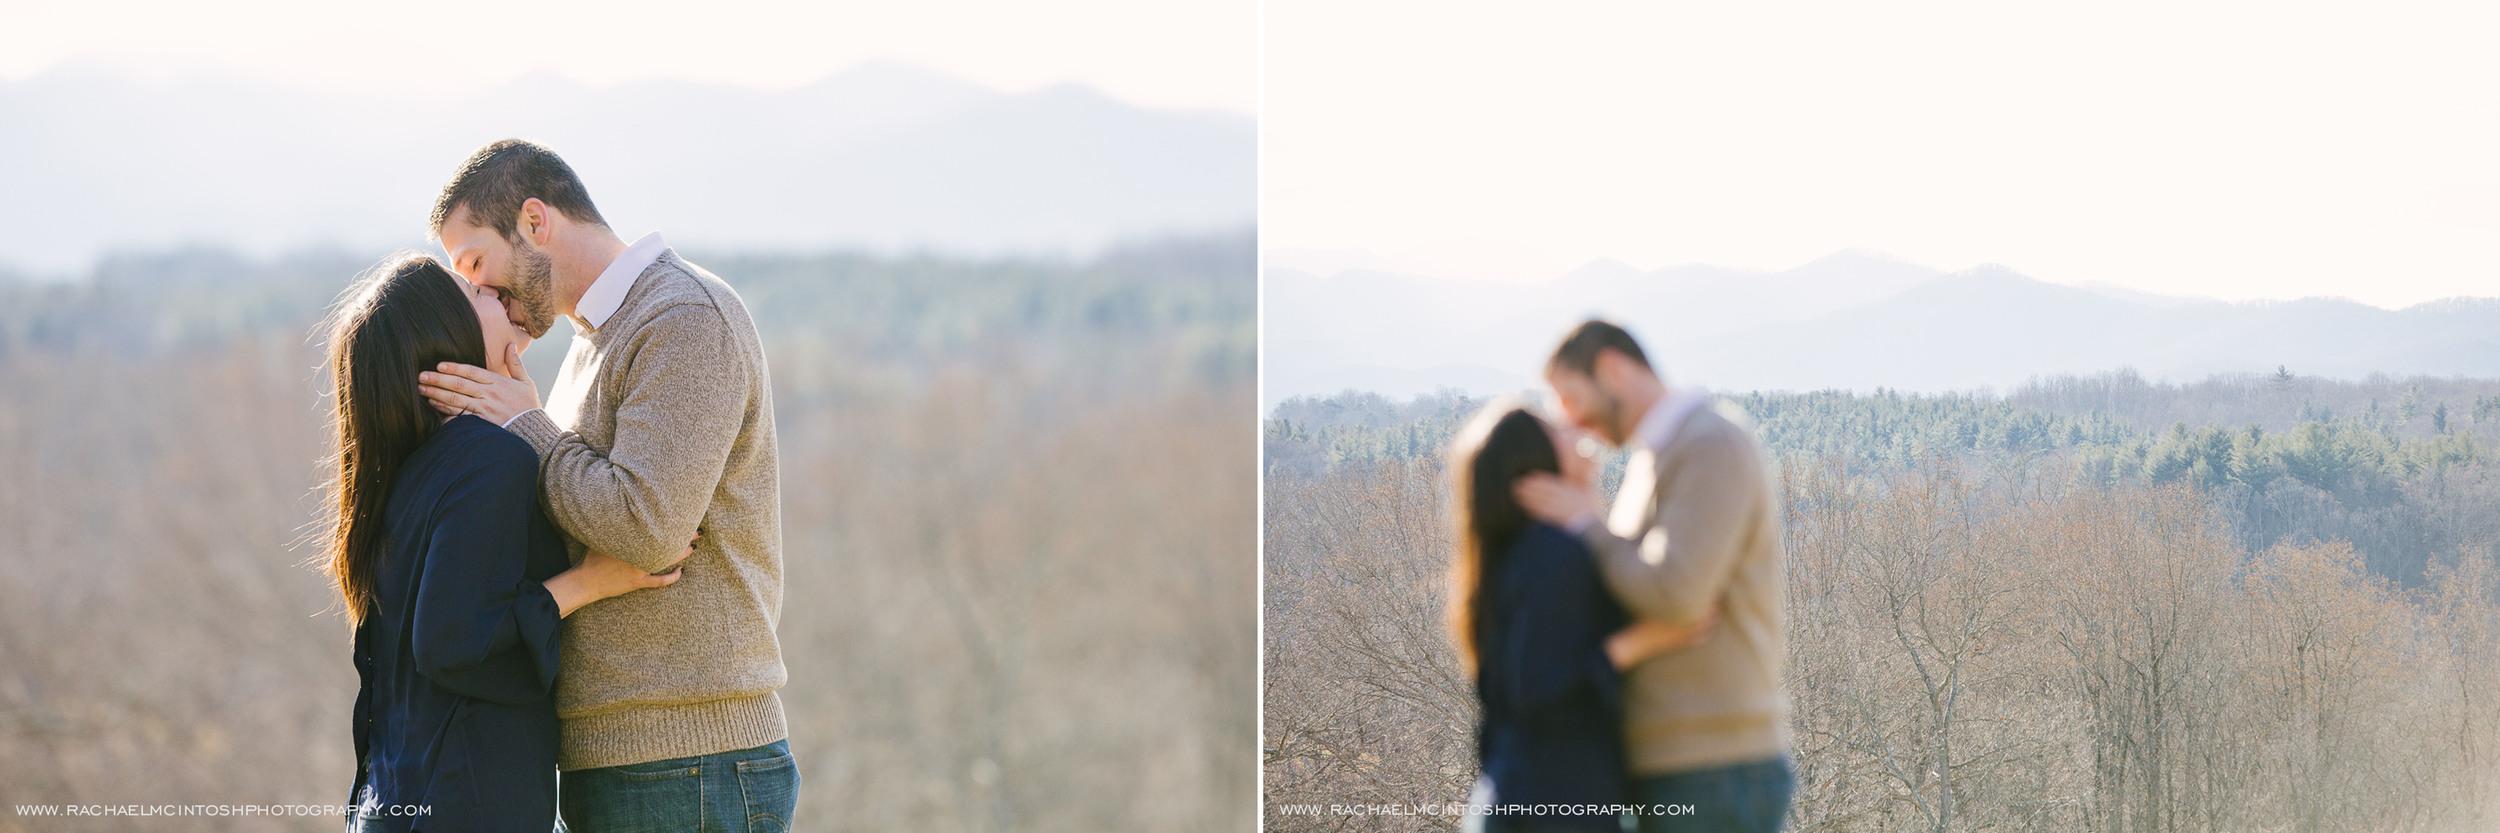 Biltmore Estate Marriage Proposal-41.jpg